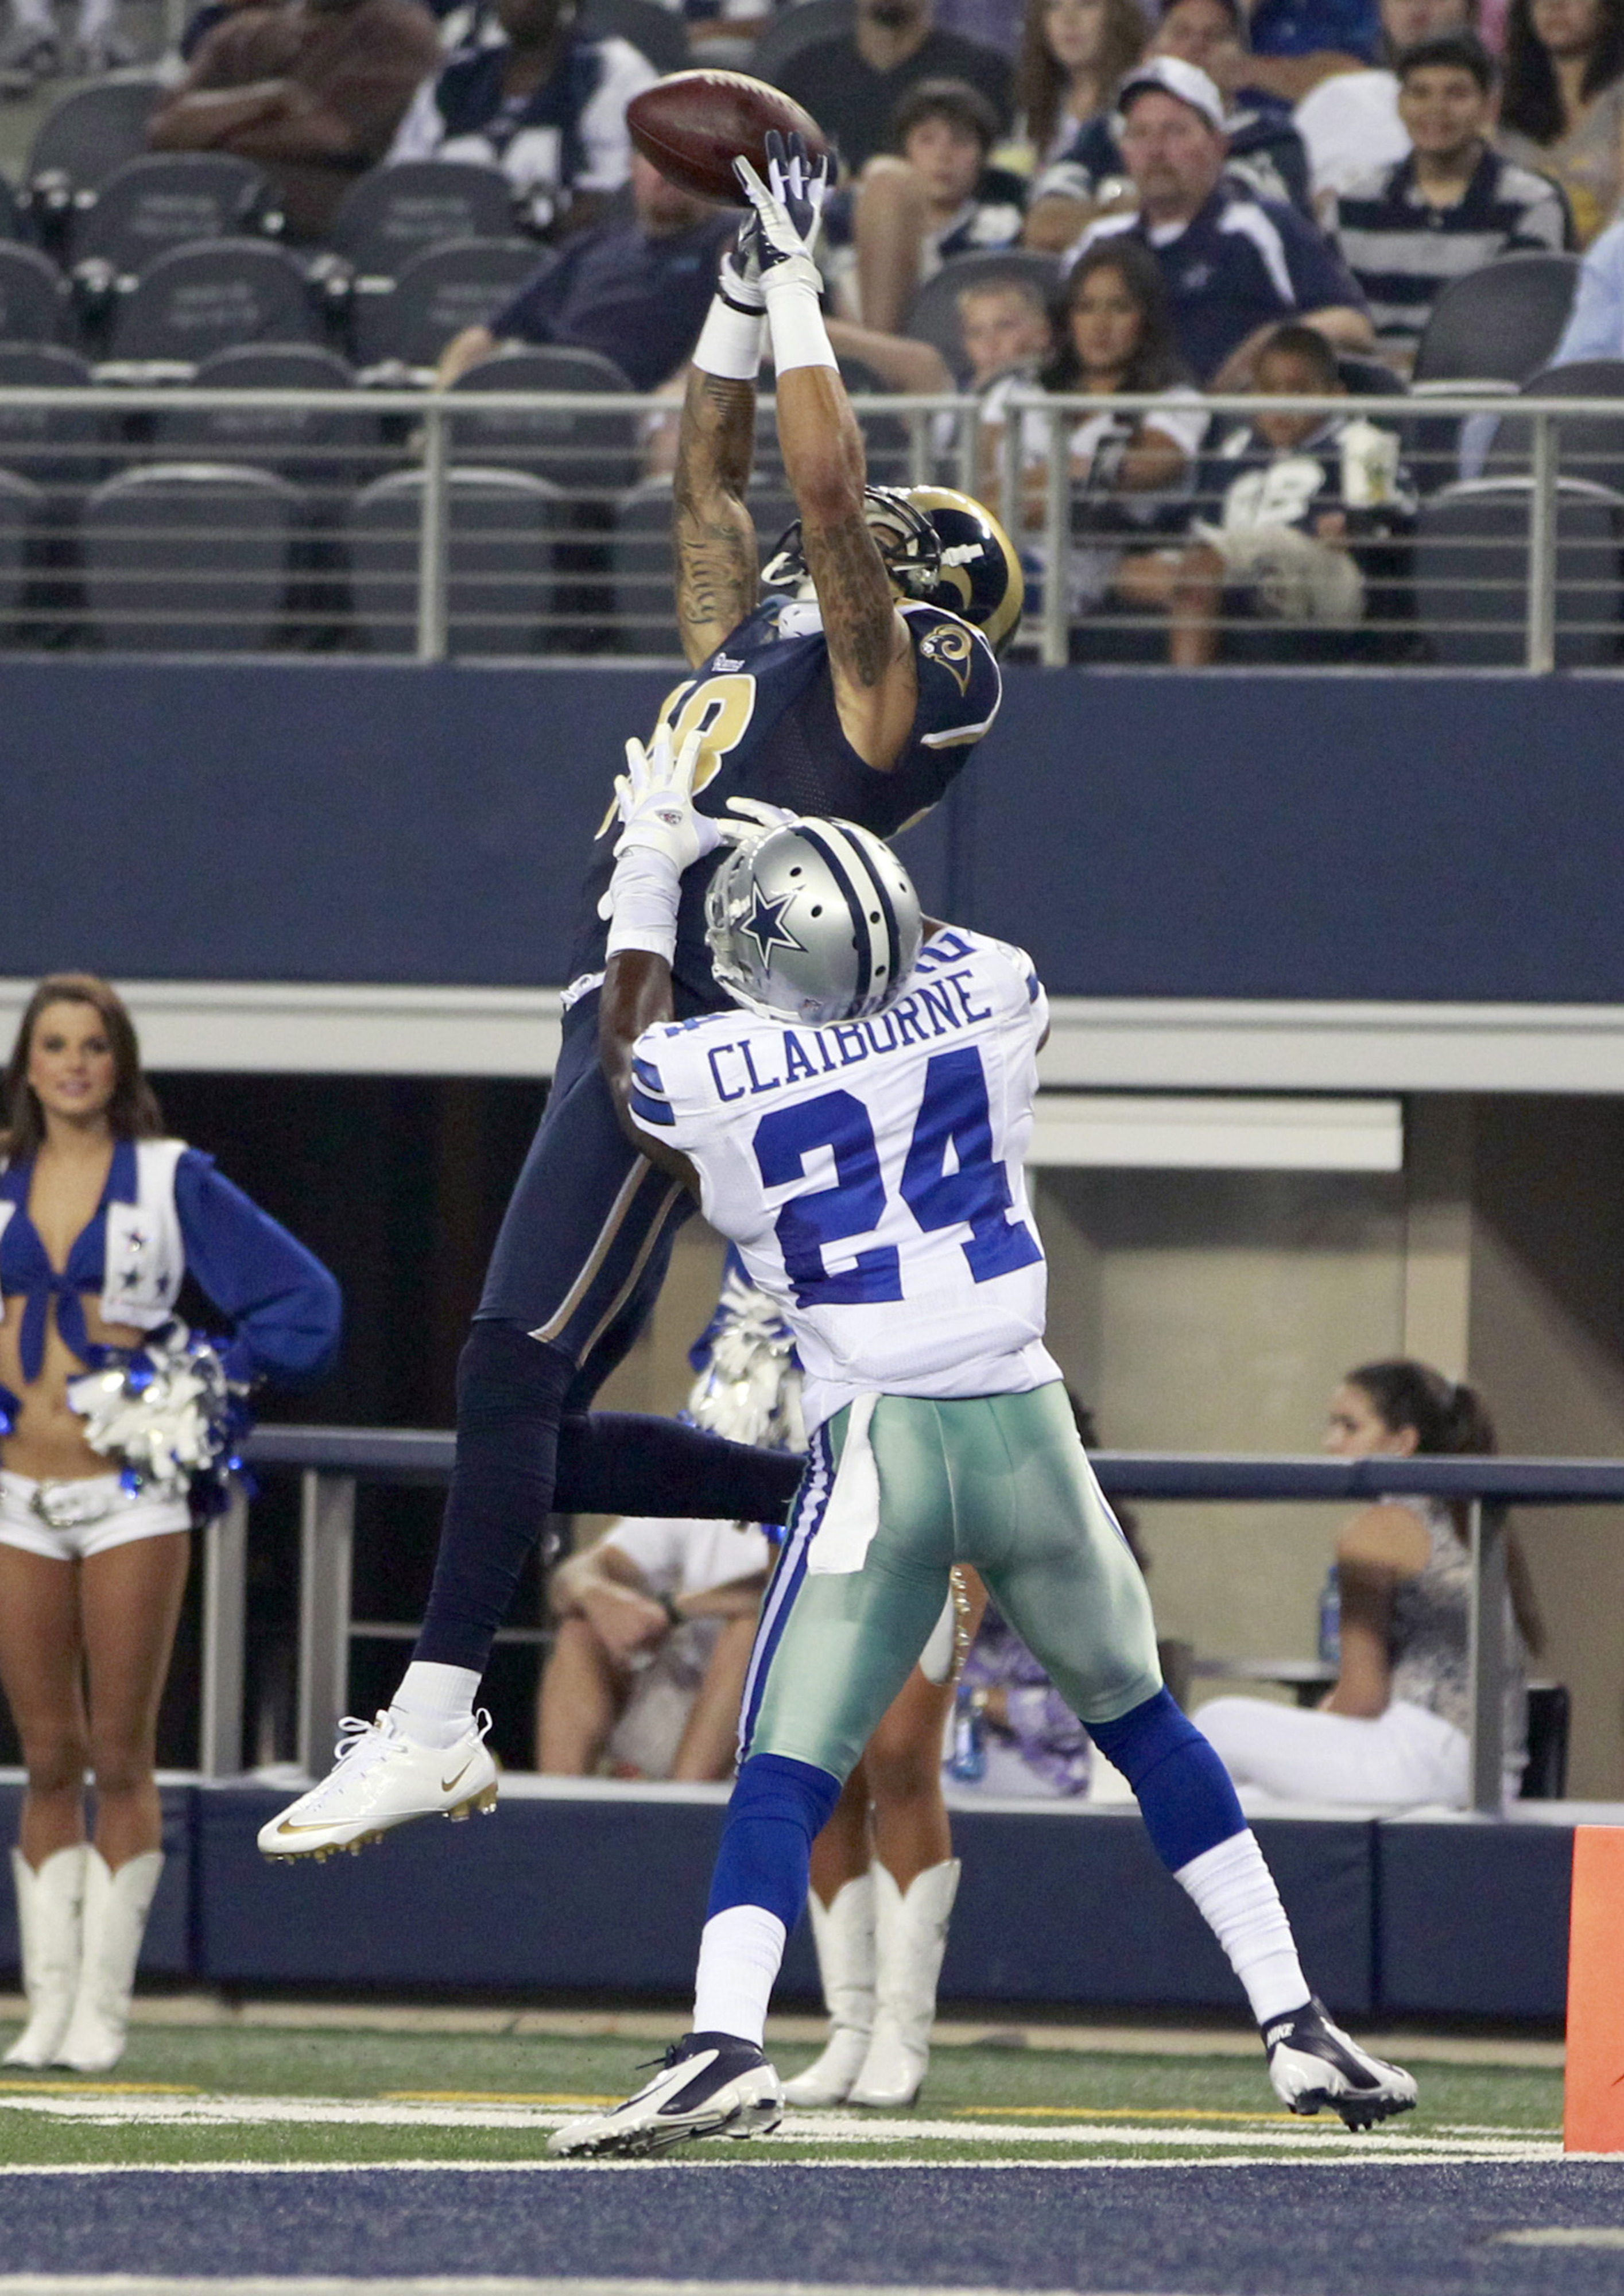 Aug 25, 2012; Arlington, TX, USA; Dallas Cowboys cornerback Morris Claiborne (24) defends a pass against St Louis Rams wide receiver Austin Pettis (18) at Cowboys Stadium. Mandatory Credit: Tim Heitman-US PRESSWIRE